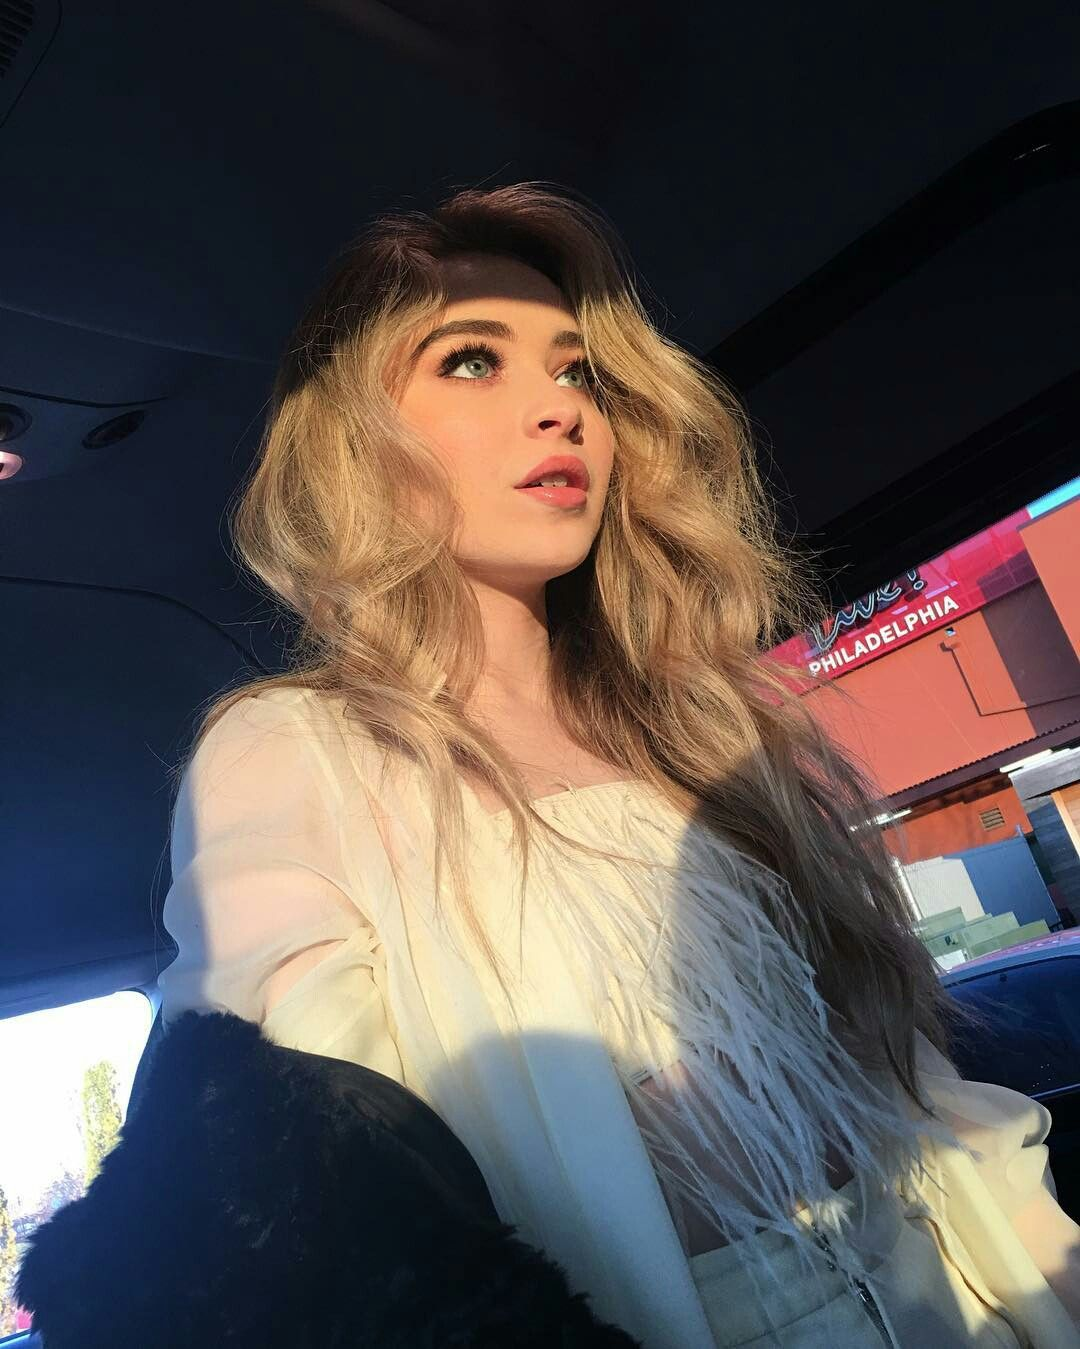 2019 Sabrina Carpenter nudes (42 photos), Pussy, Cleavage, Selfie, panties 2017